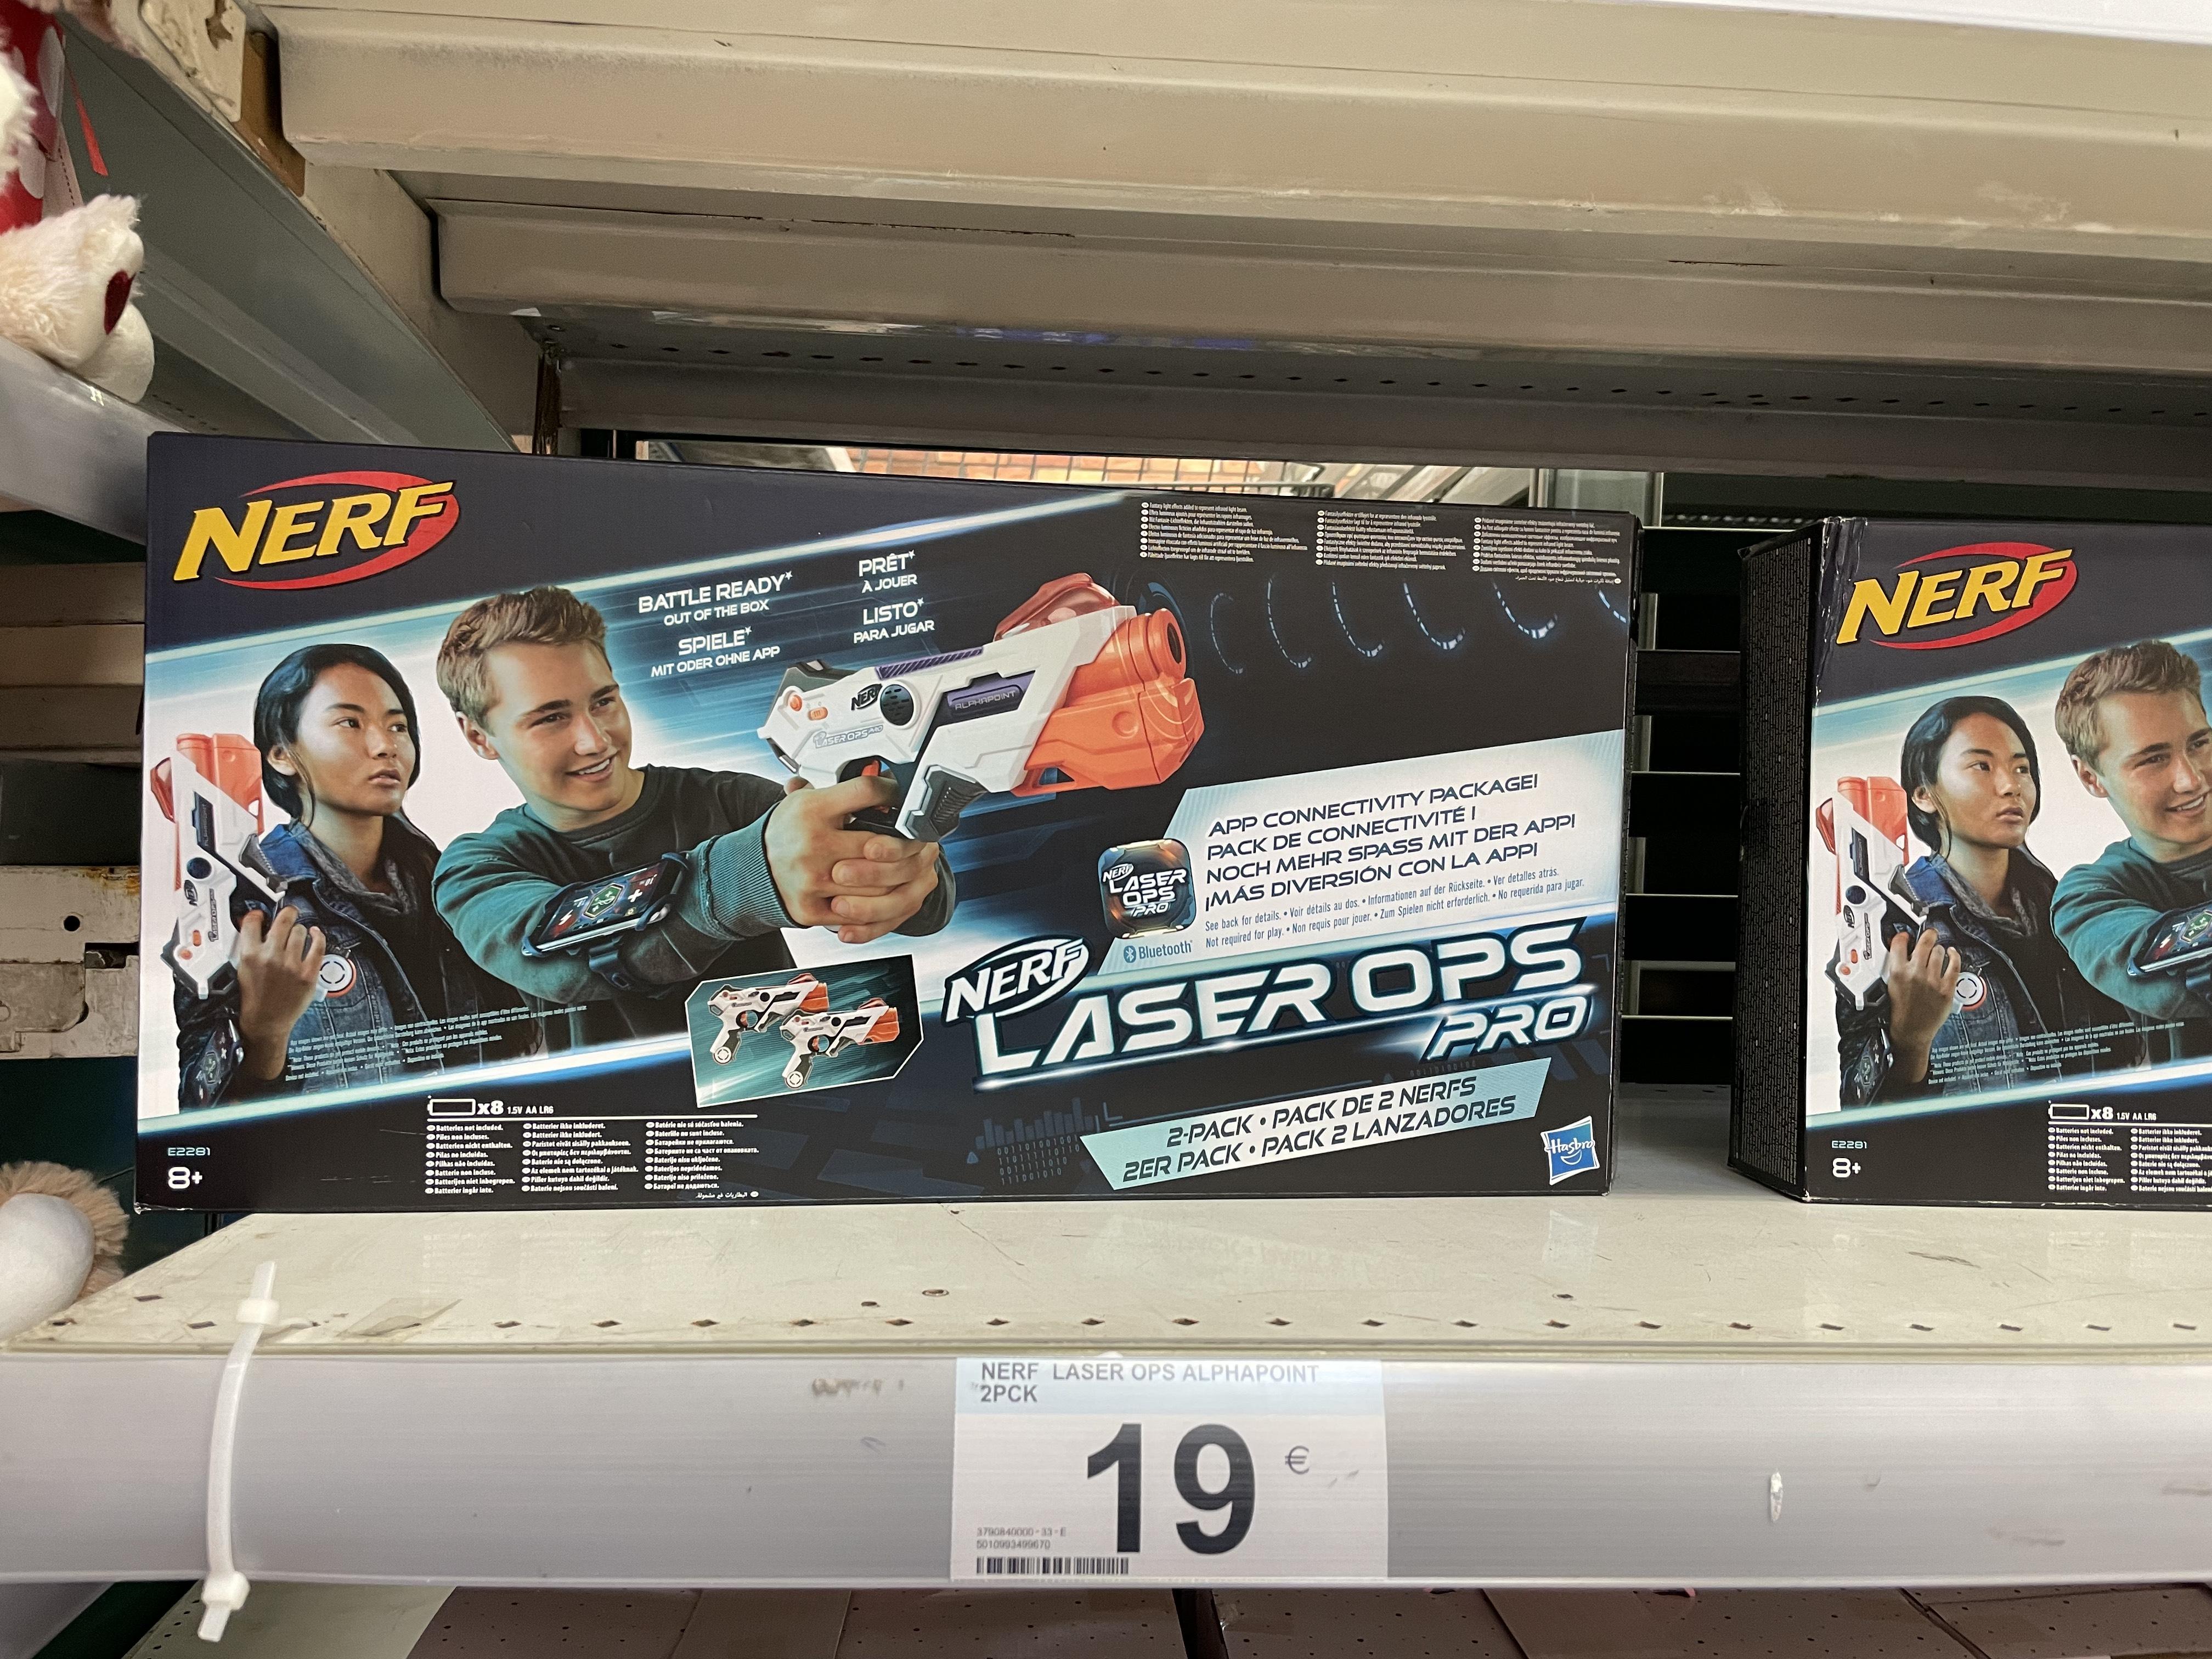 Nerf Laser Ops Pro en el Carrefour de Alfonso Molina - Coruña